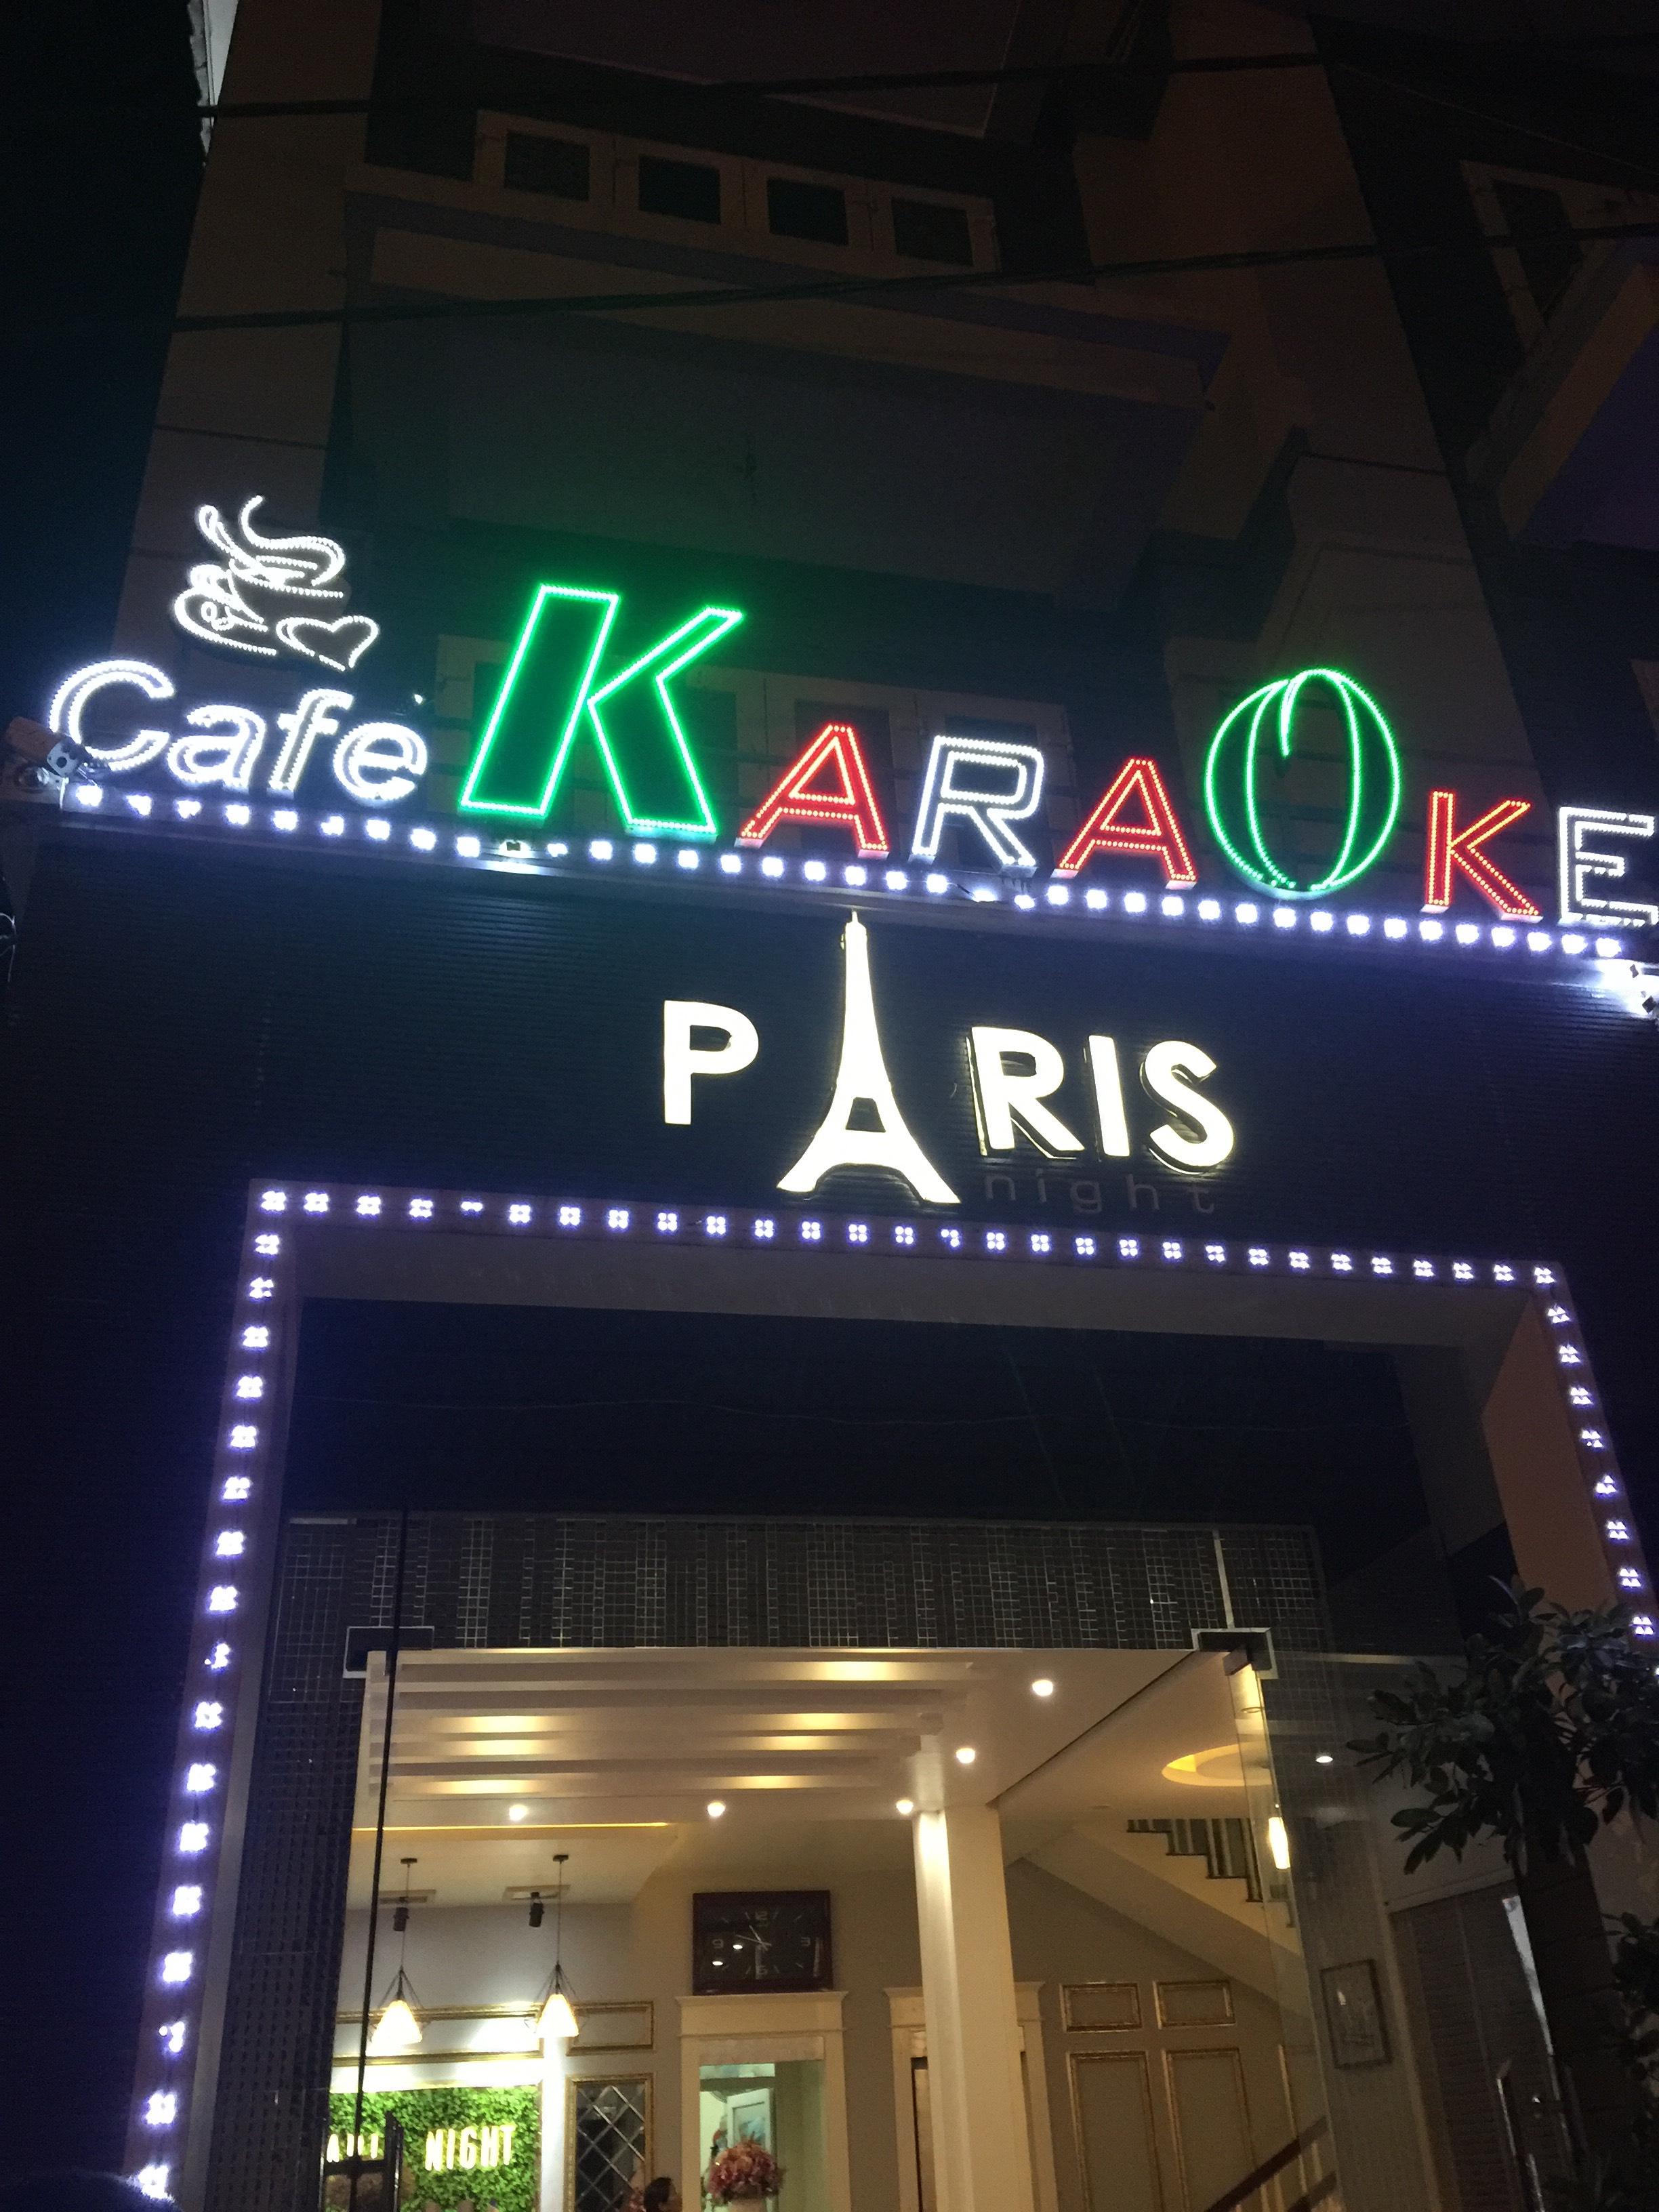 hanh-trinh-tu-van-thiet-bi-phong-chay-chua-chay-Karaoke-tai-Lai-Chau